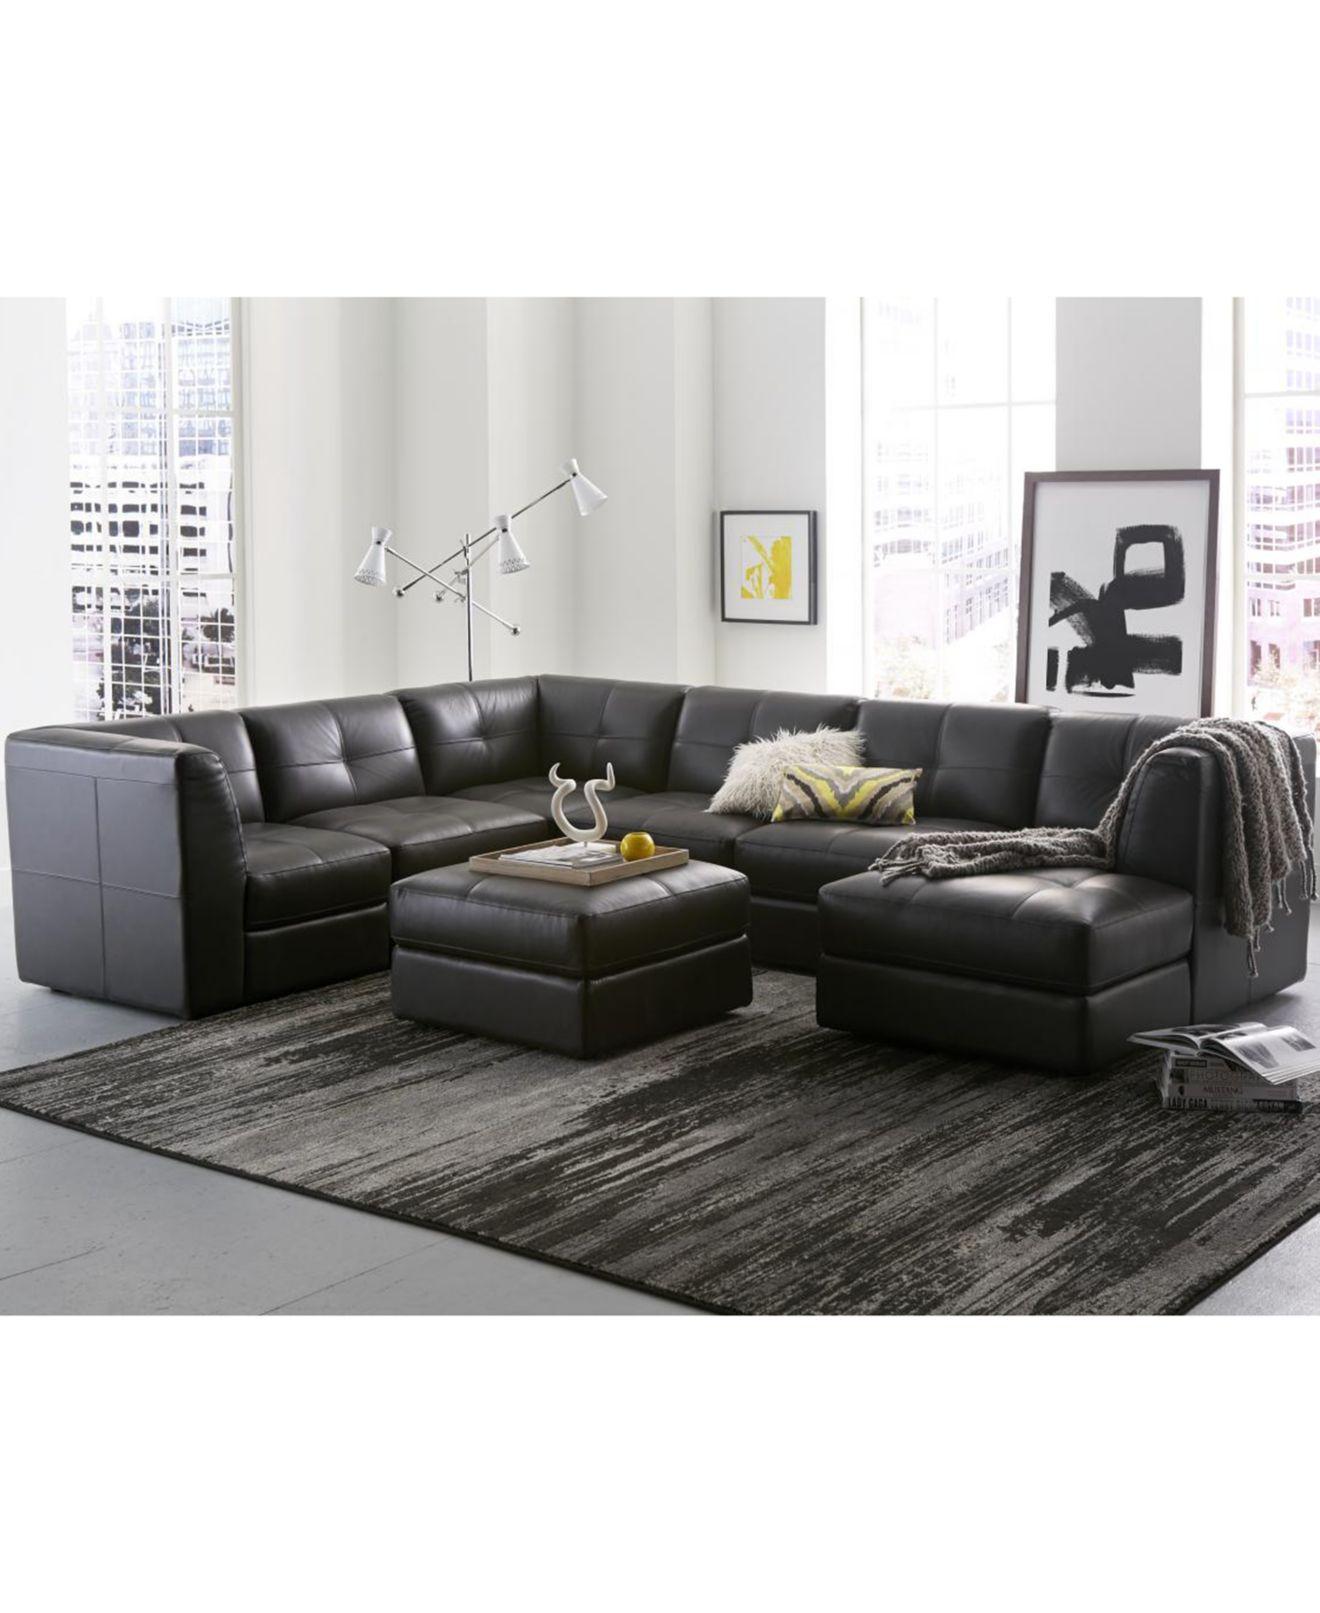 bauhaus sectional sofas